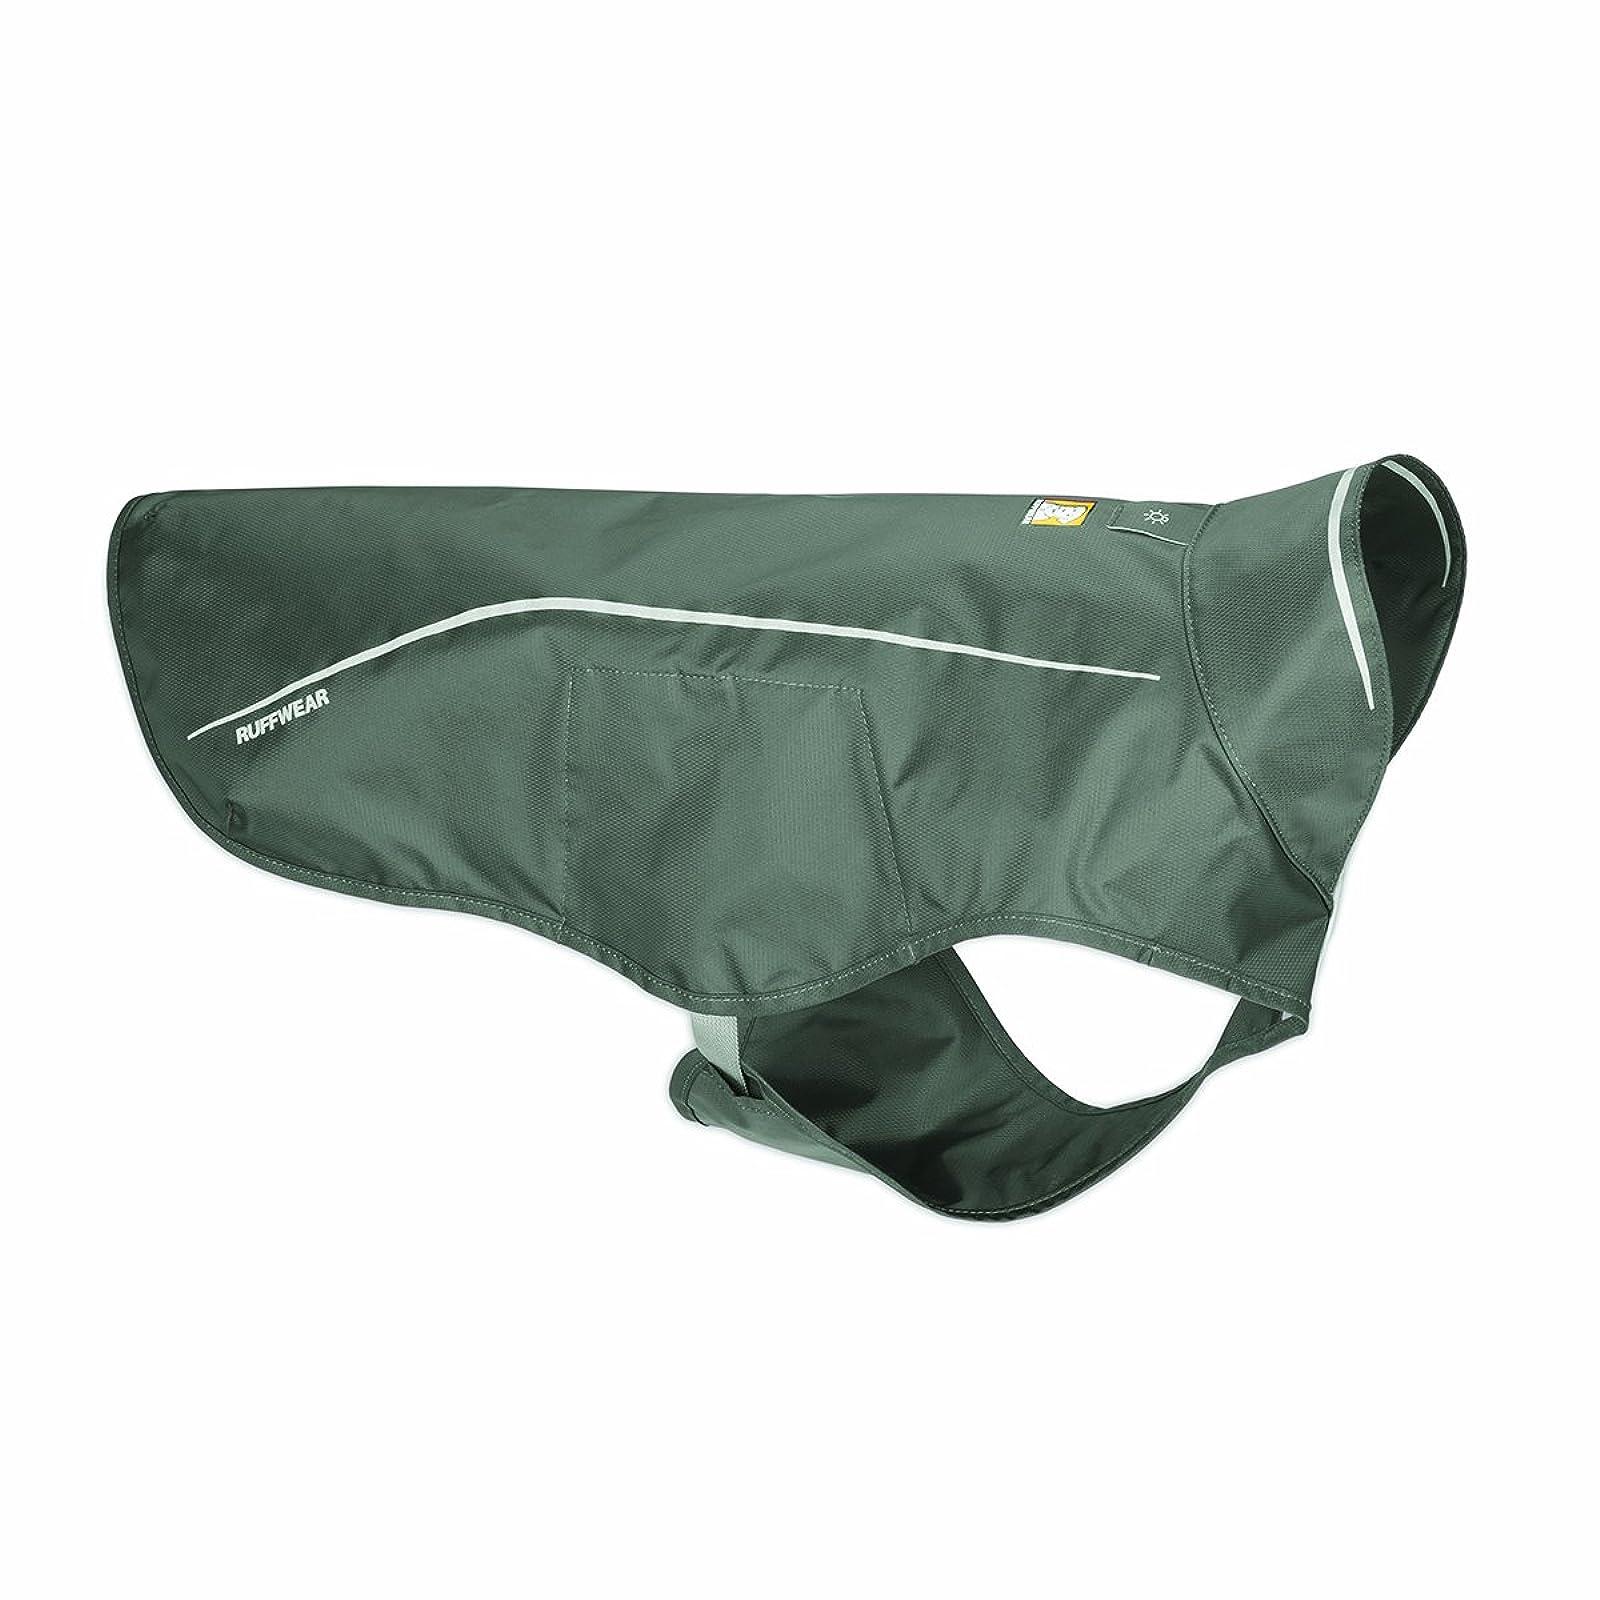 Ruffwear - Sun Shower (Waterproof Rain Jacket) Granite - 4